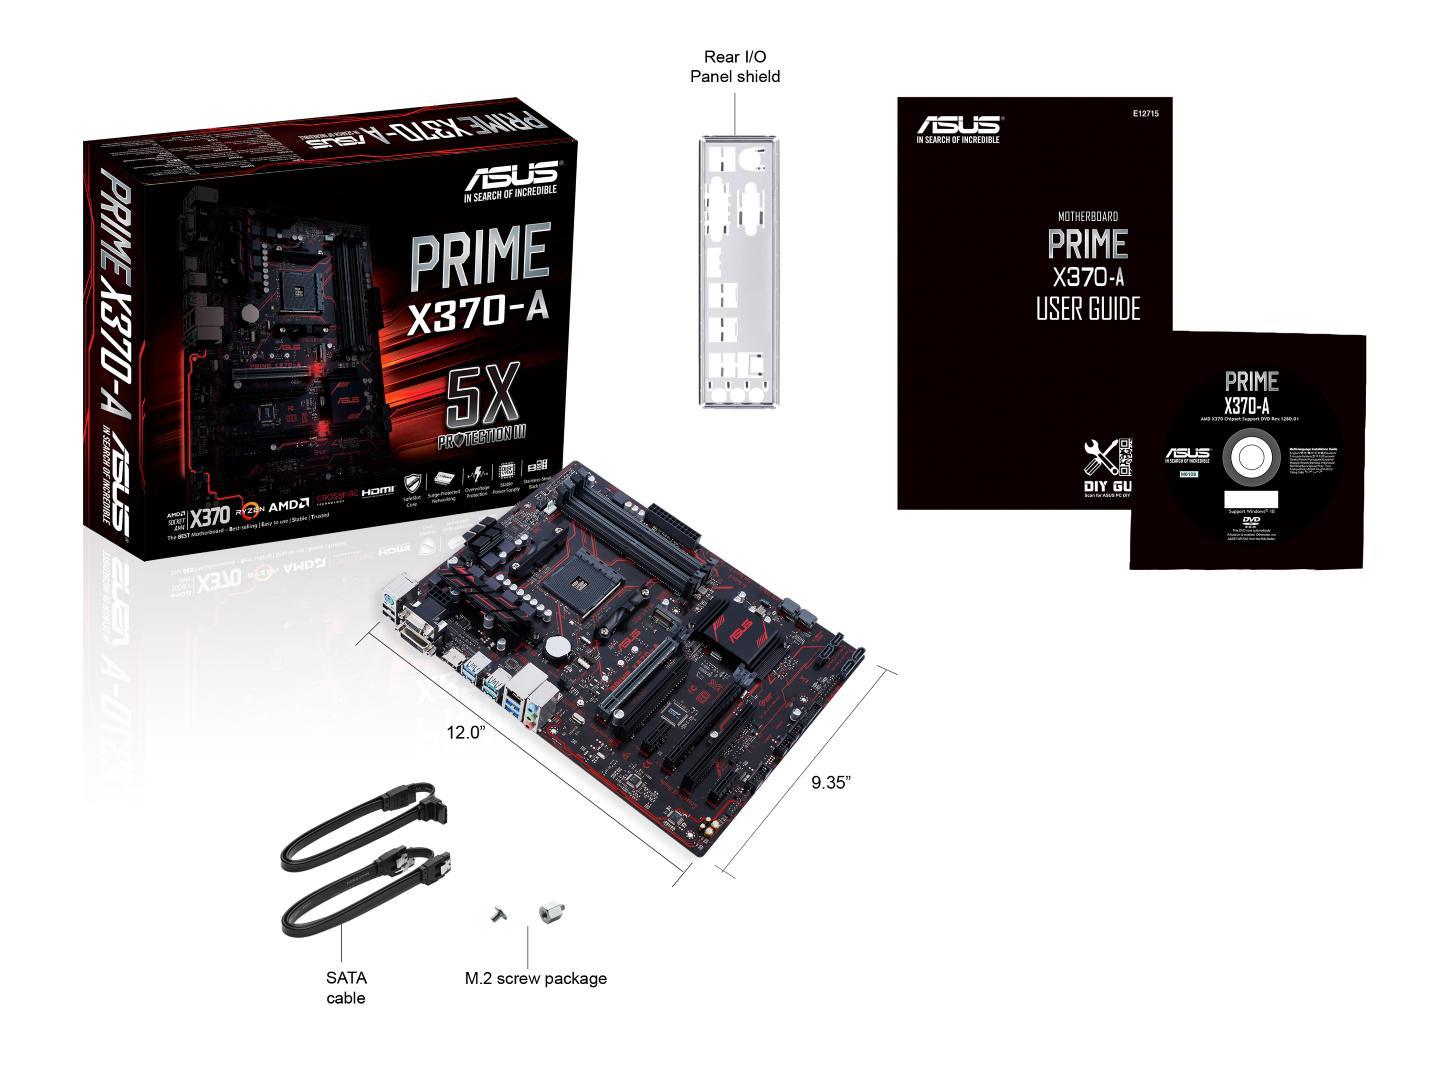 Asus PRIME X370-A ATX AM4